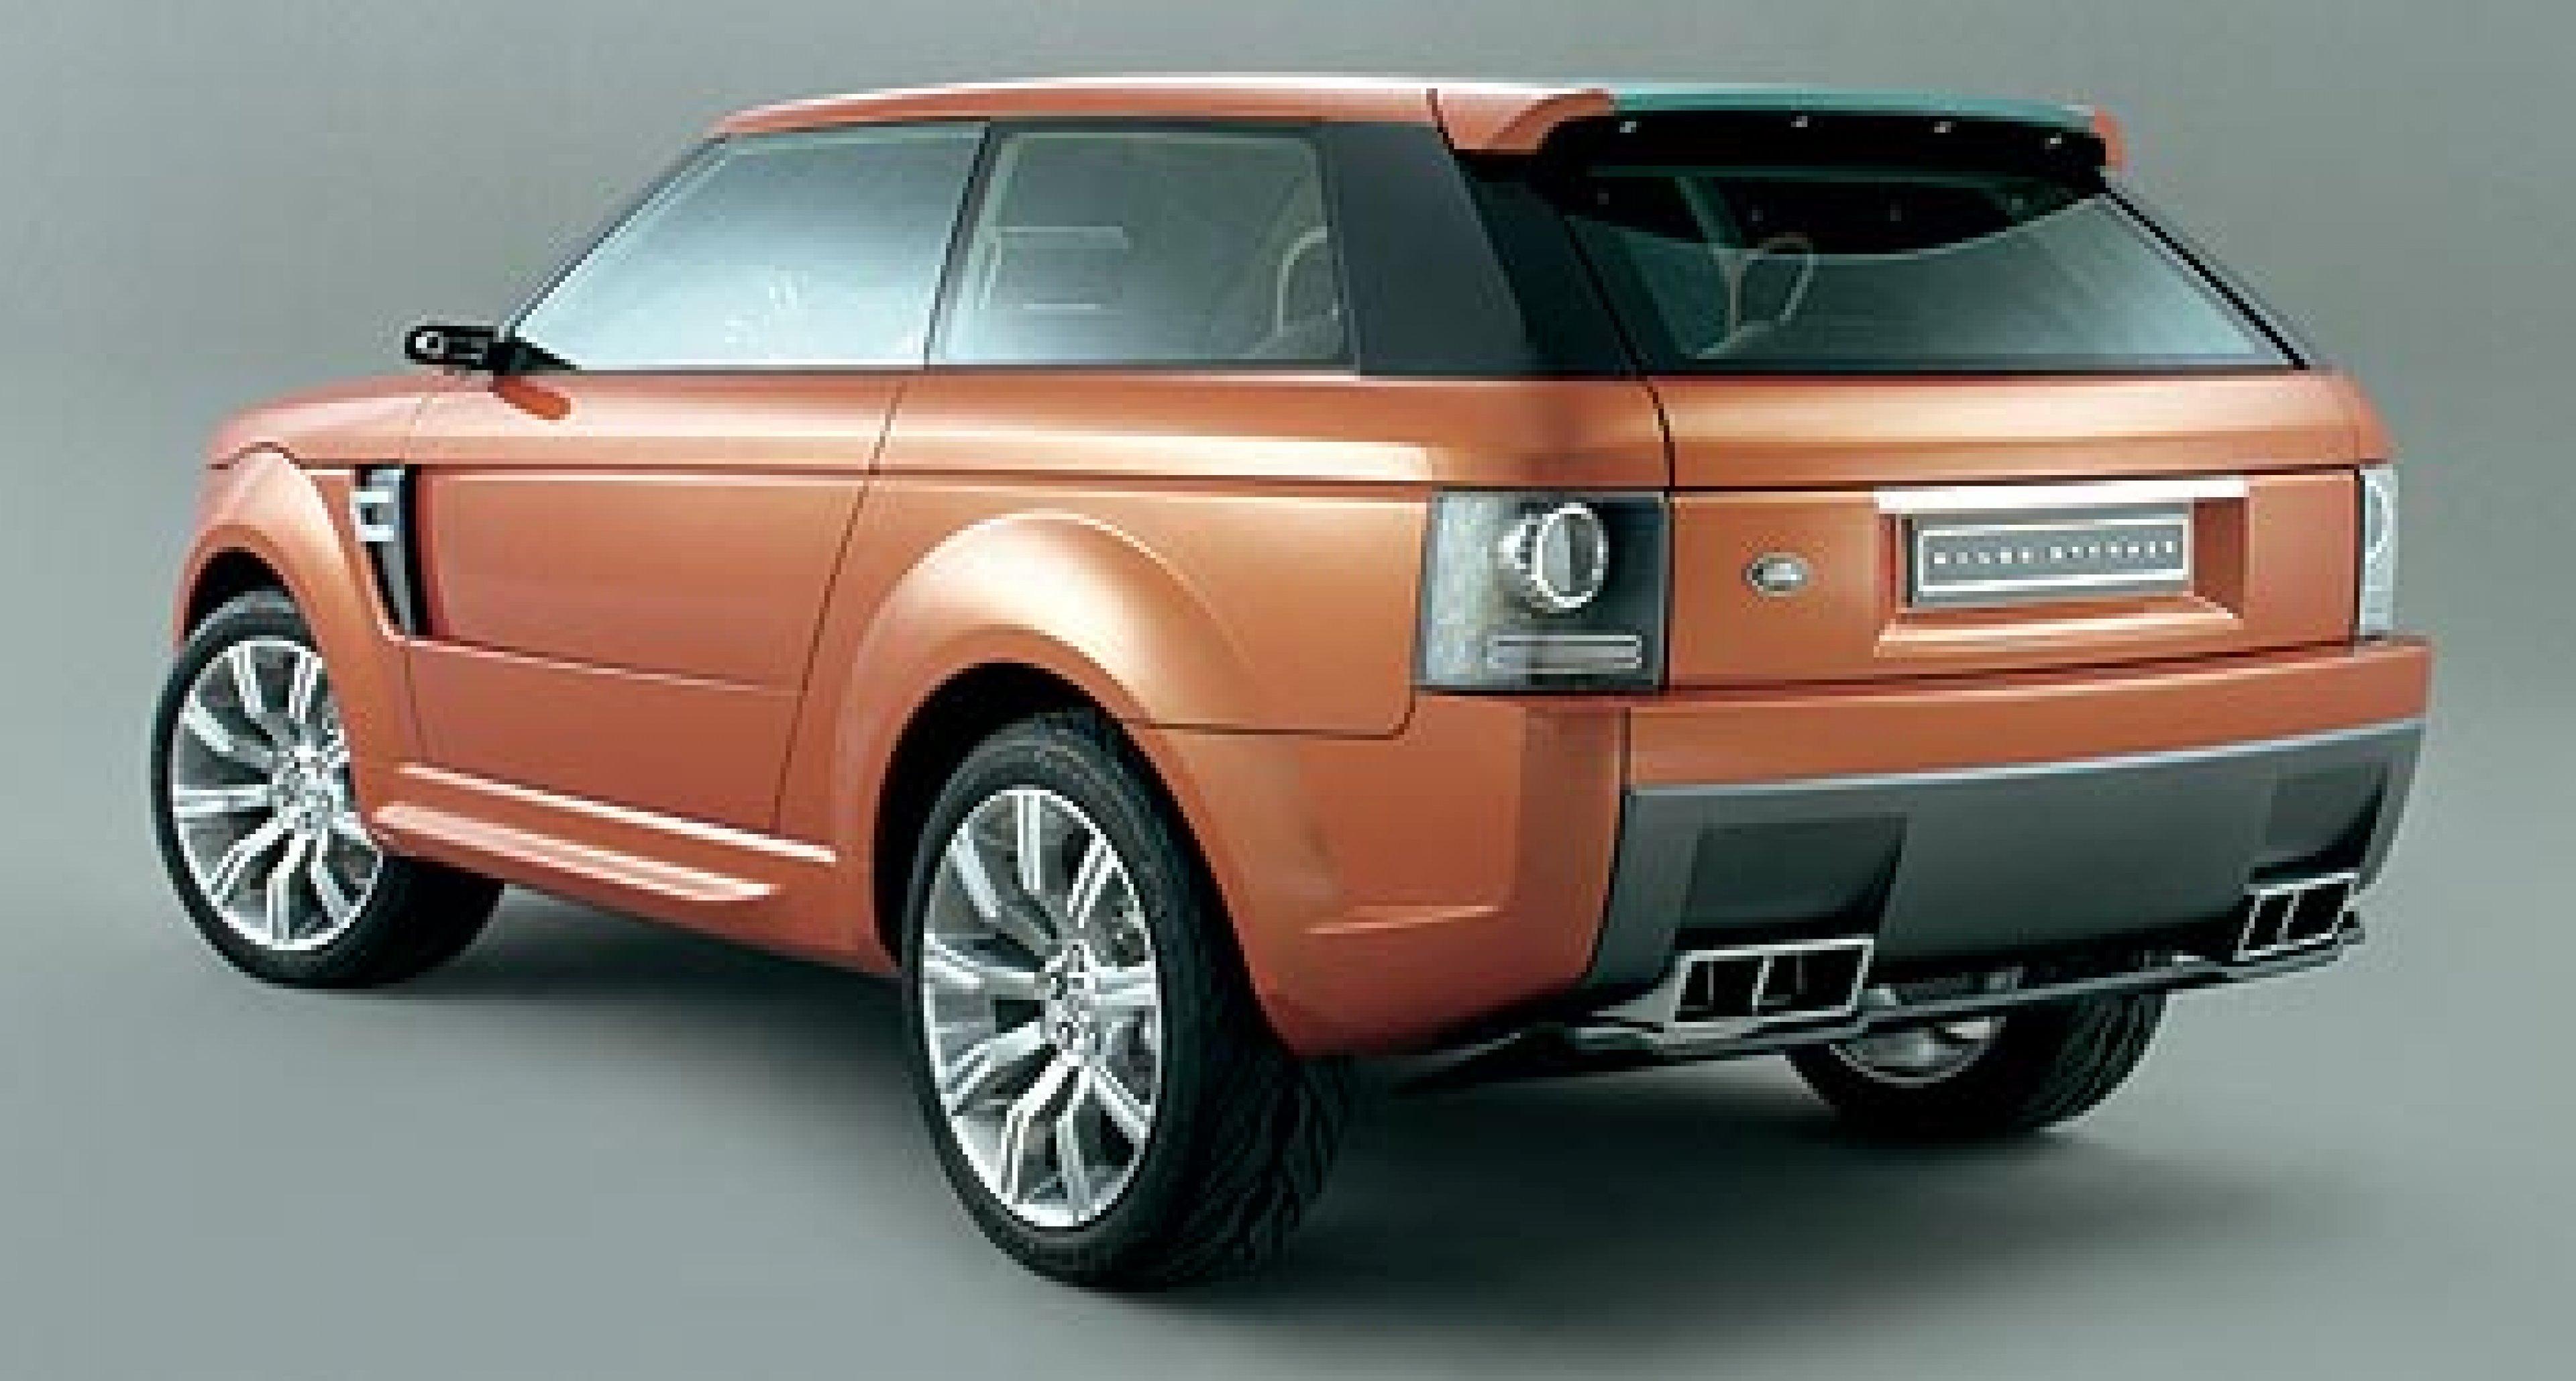 Land Rover unveils first ever concept show car at Detroit Auto Show